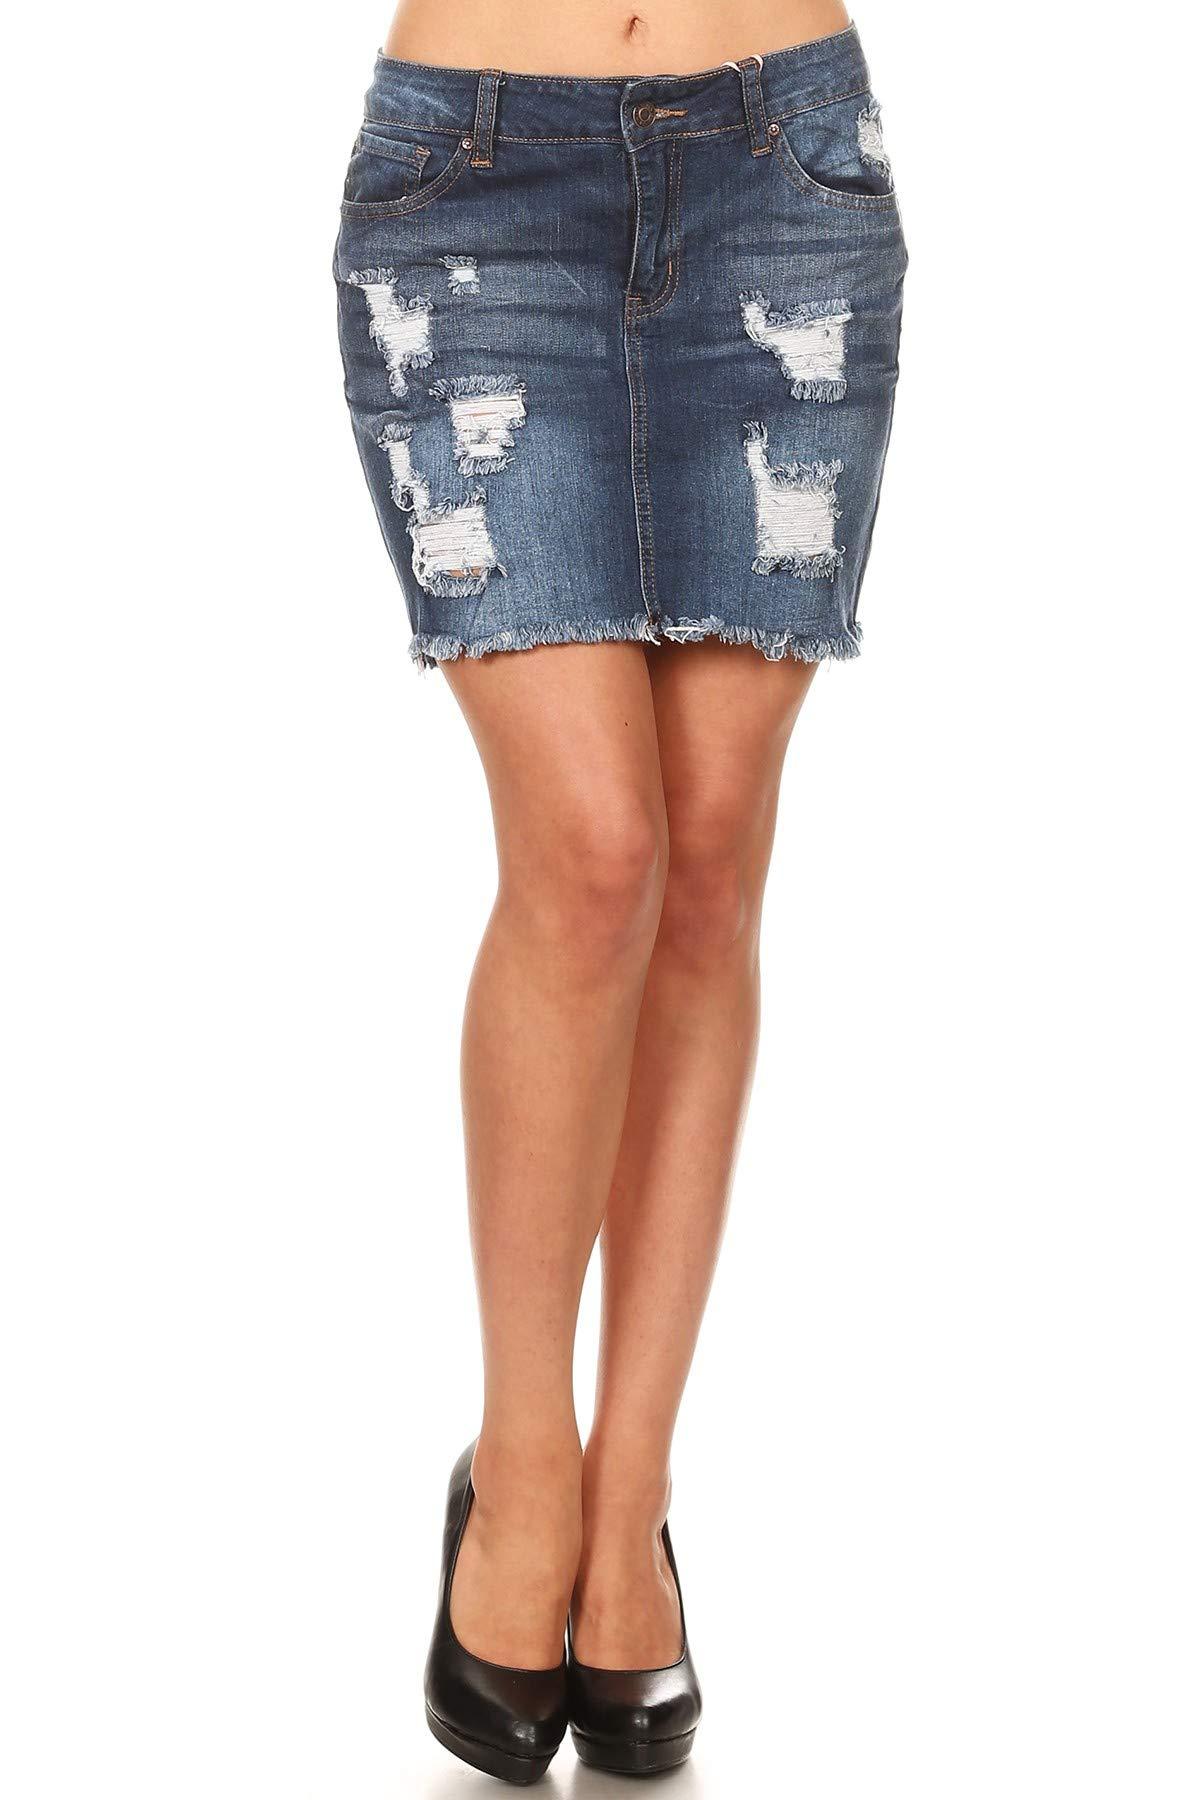 Wax Women's Juniors Vintage Casual Distressed A-Line Denim Short Skirt (Small)